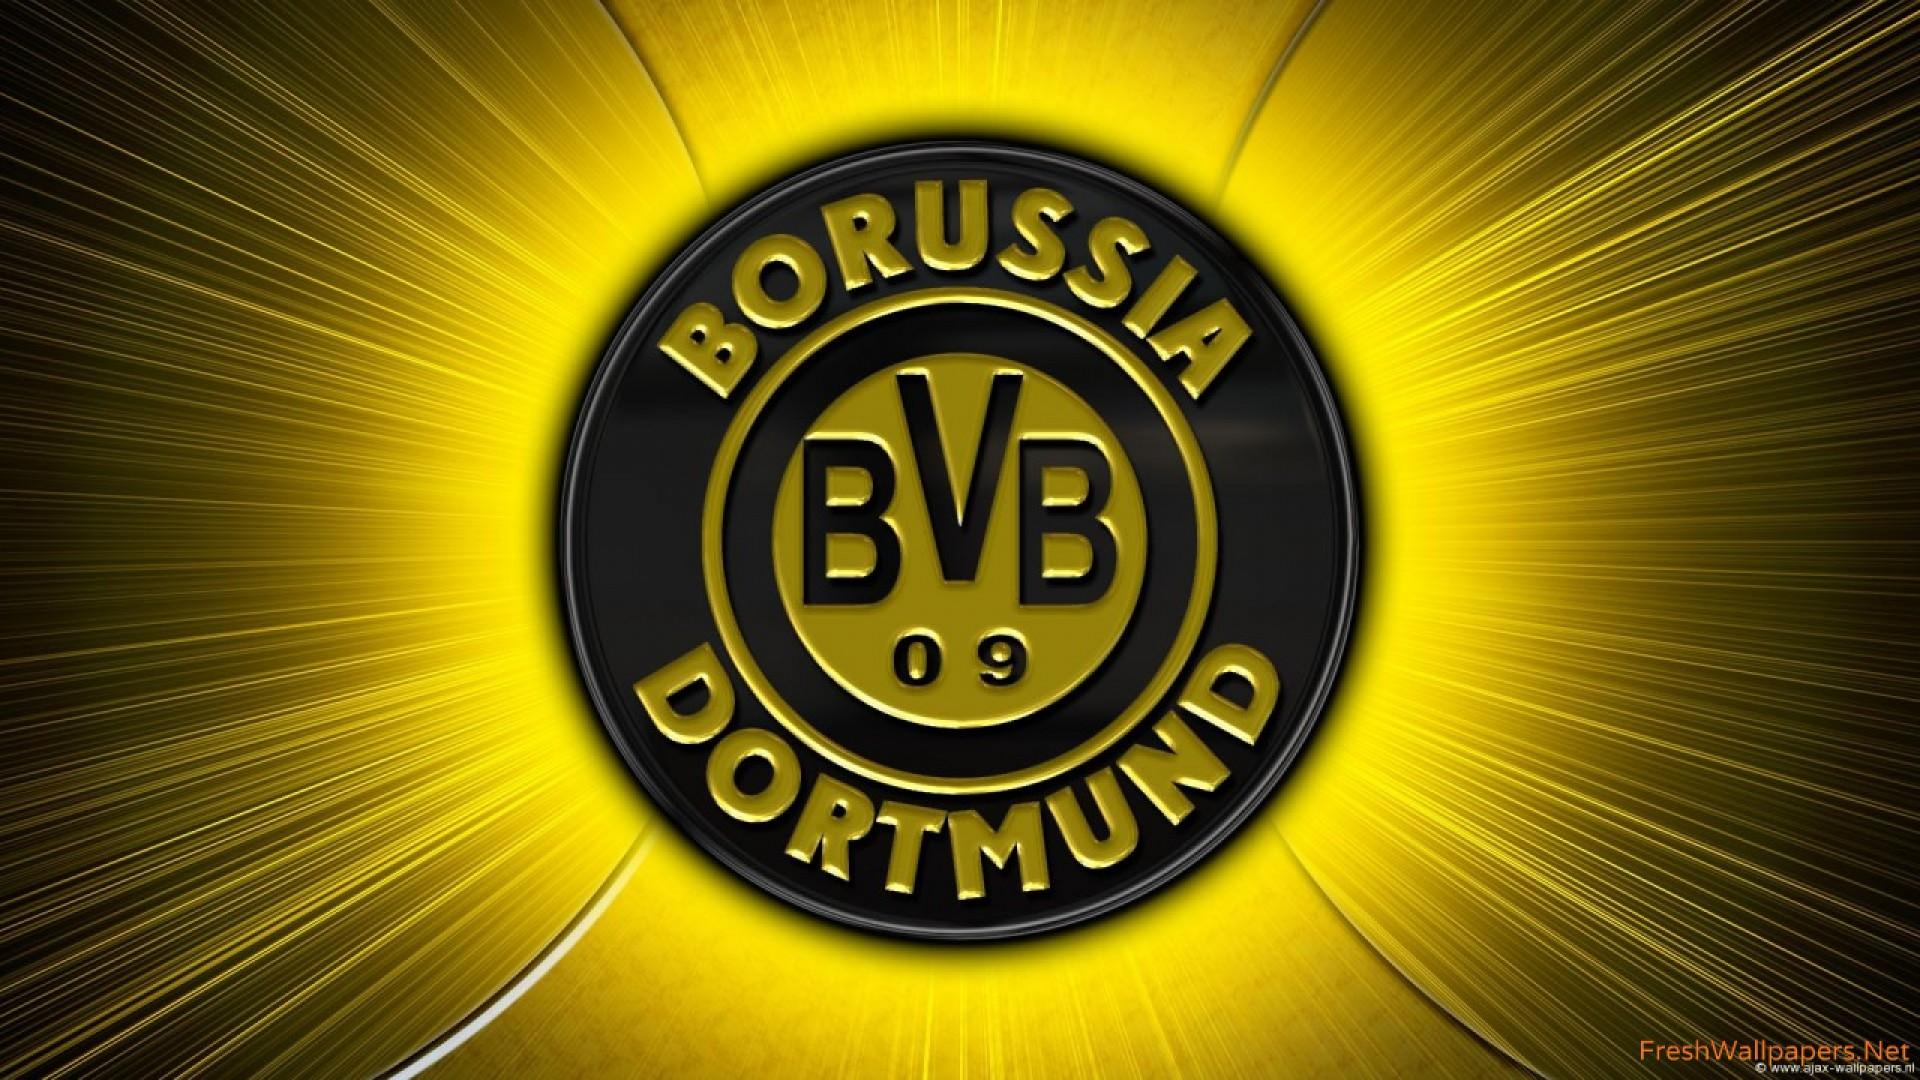 Borussia Dortmund Hd Wallpapers Backgrounds Wallpaper 1920x1080